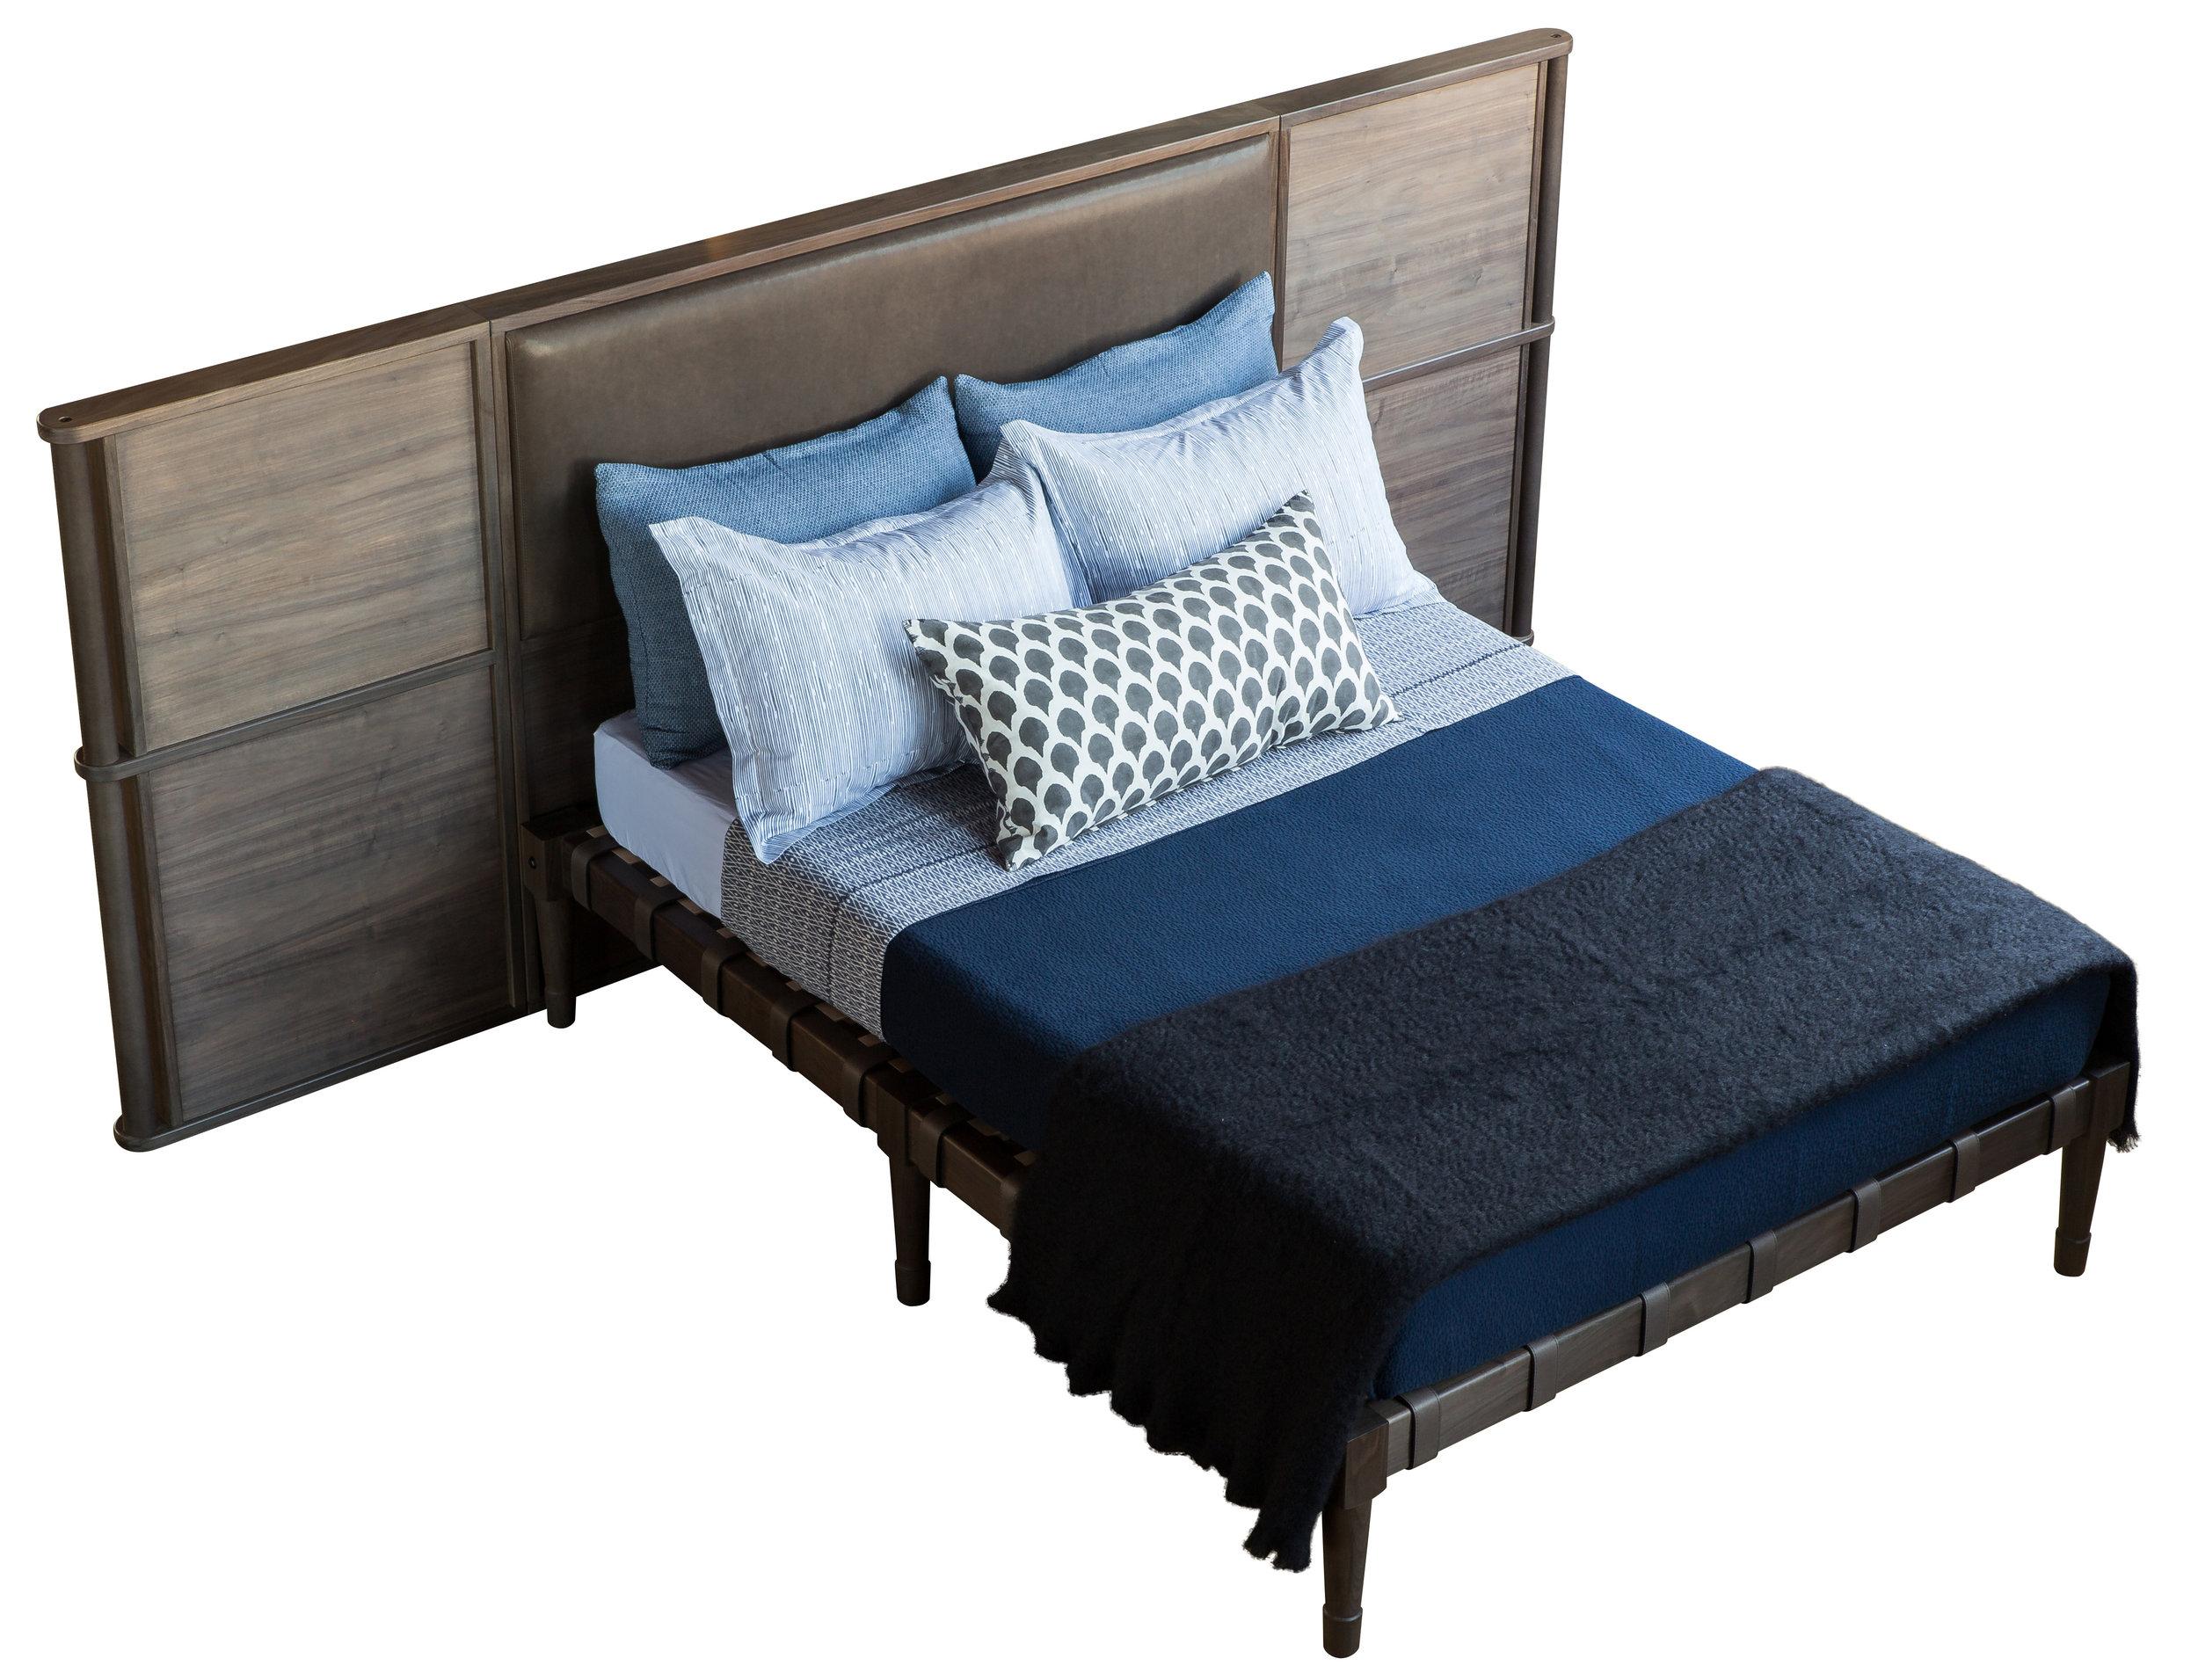 Jasper Bed with Headboard